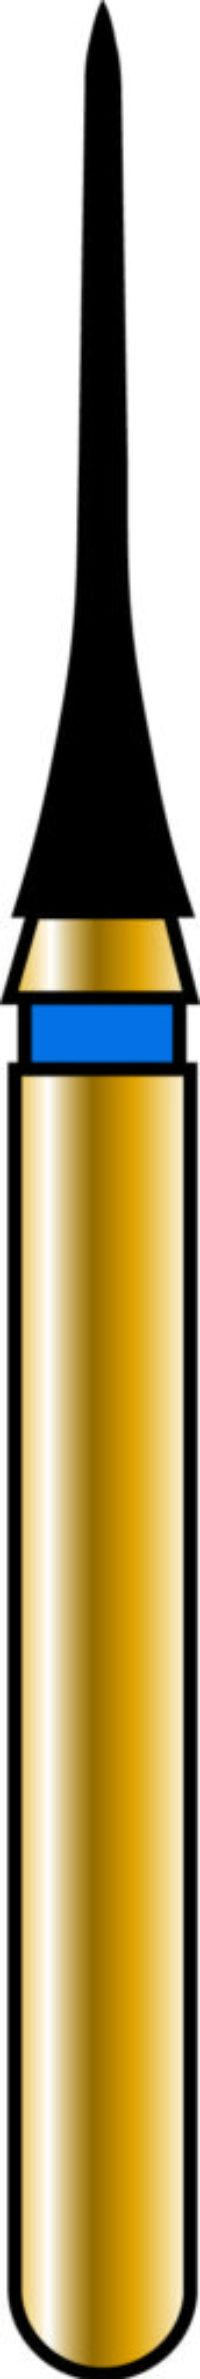 Interproximal 16-6mm Gold Diamond Bur